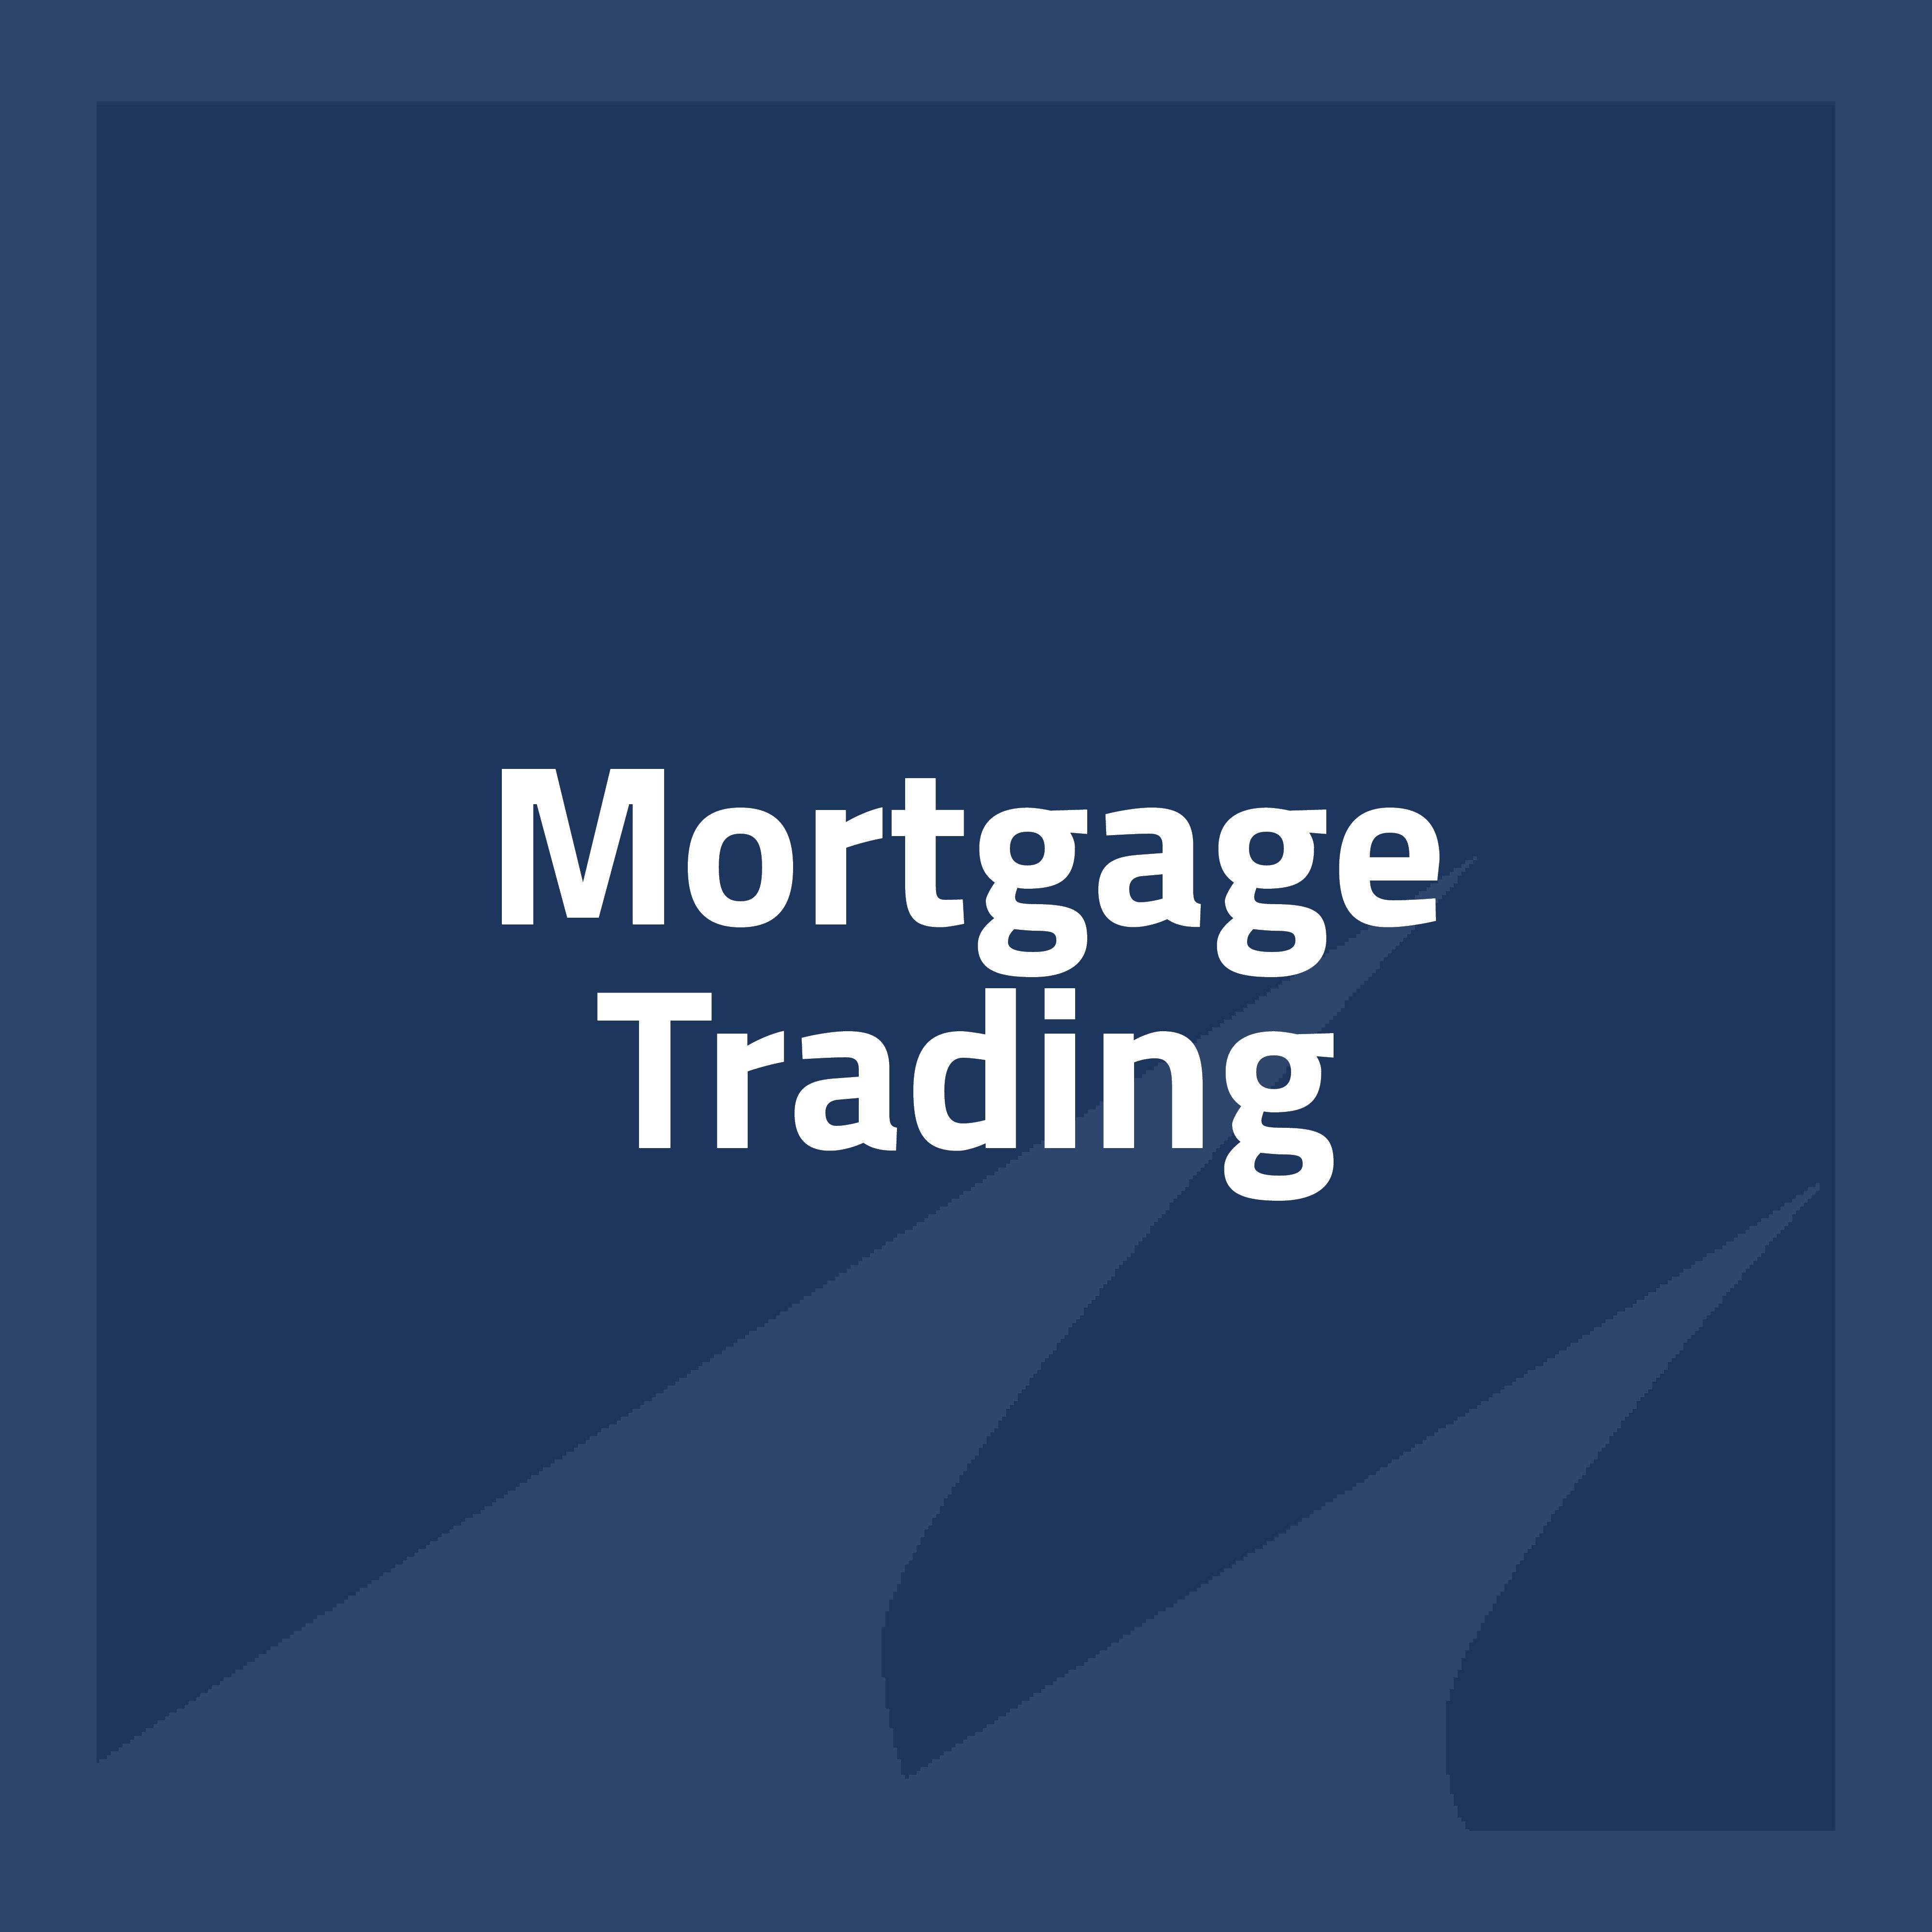 MortgageTrading-1